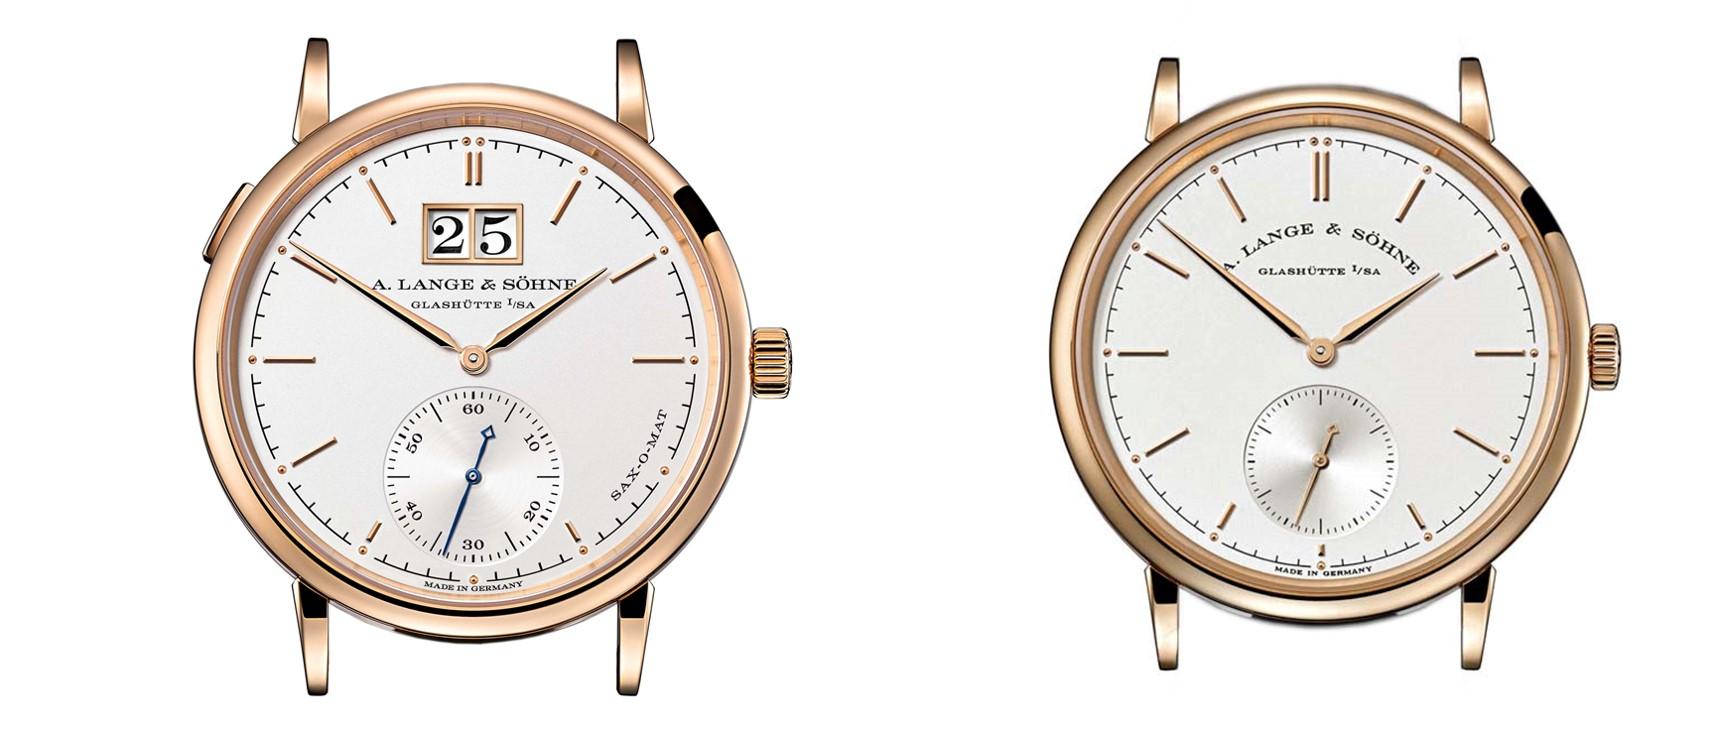 A Lange Söhne Saxonia automatic 308.047 and 308.032 dial comparison